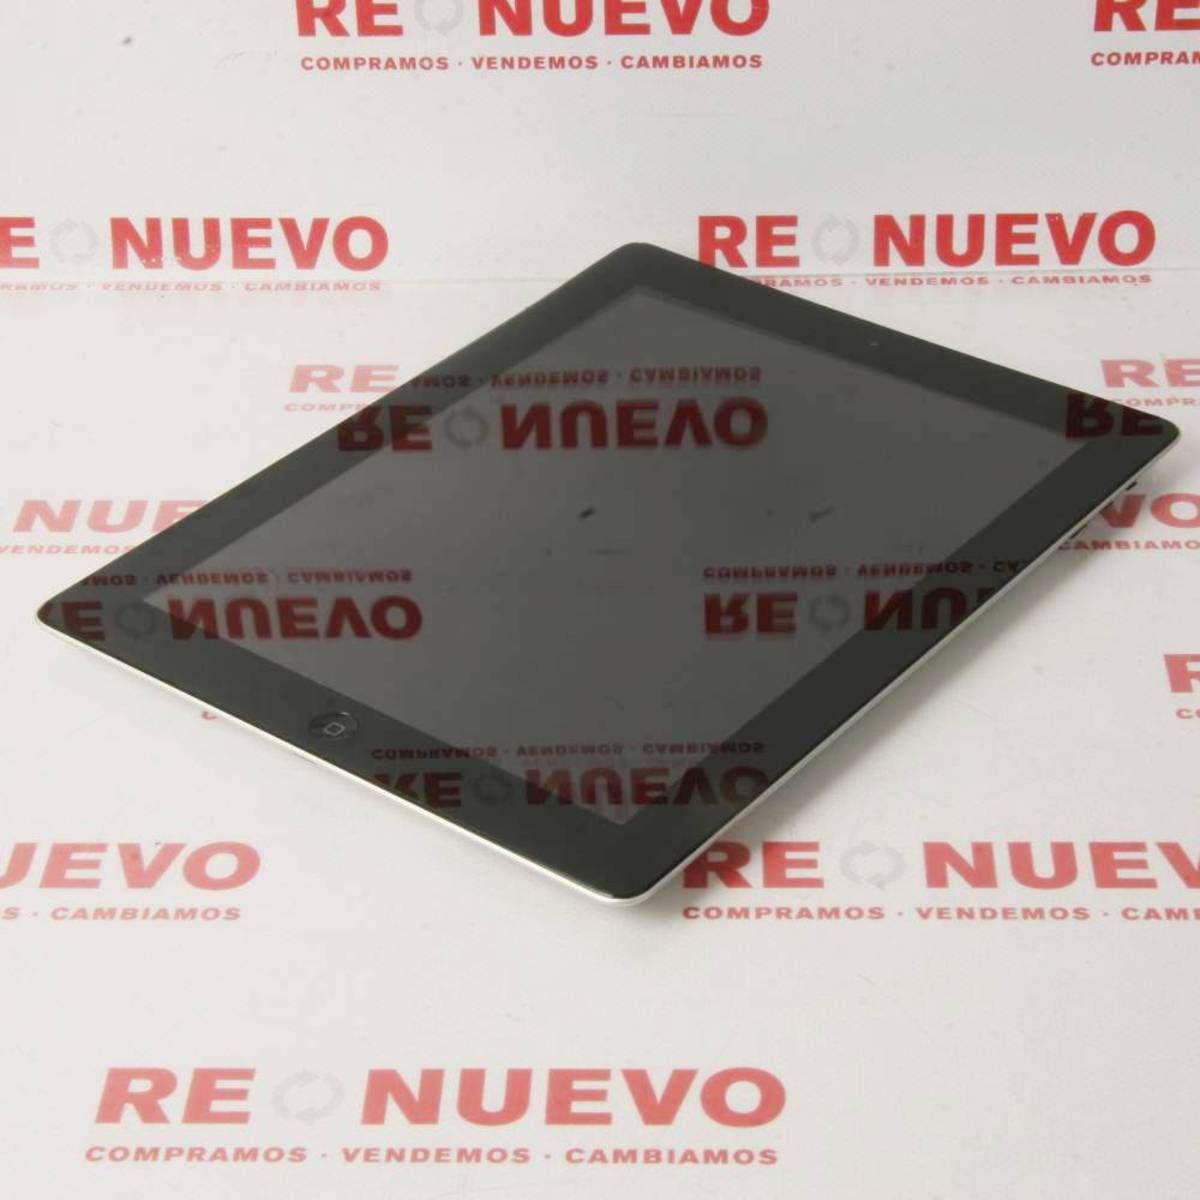 Ipad 4 16gb Wifi Cell De Segunda Mano E270523 Tienda Online De